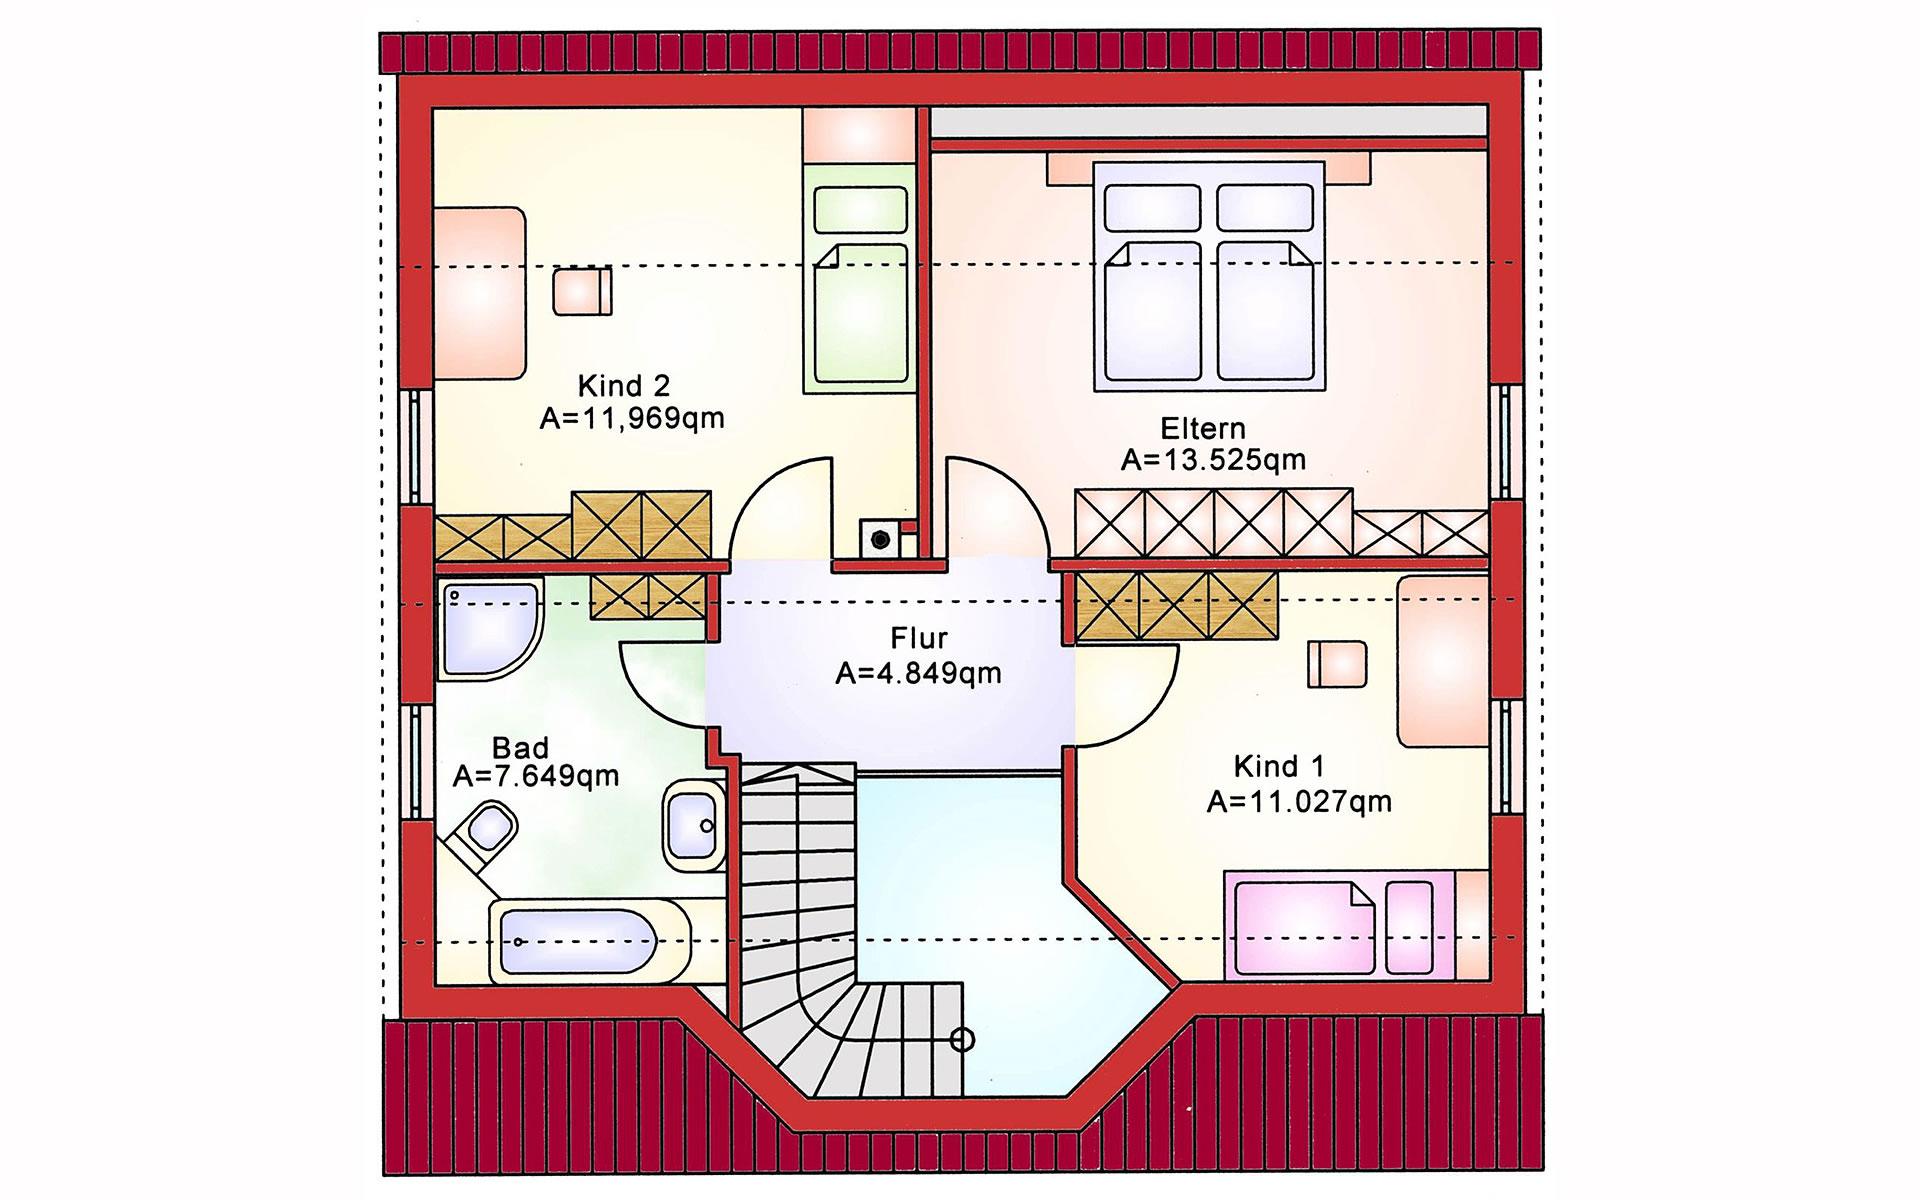 Dachgeschoss Basic BS 112 von B&S Selbstbausysteme GmbH & Co. KG